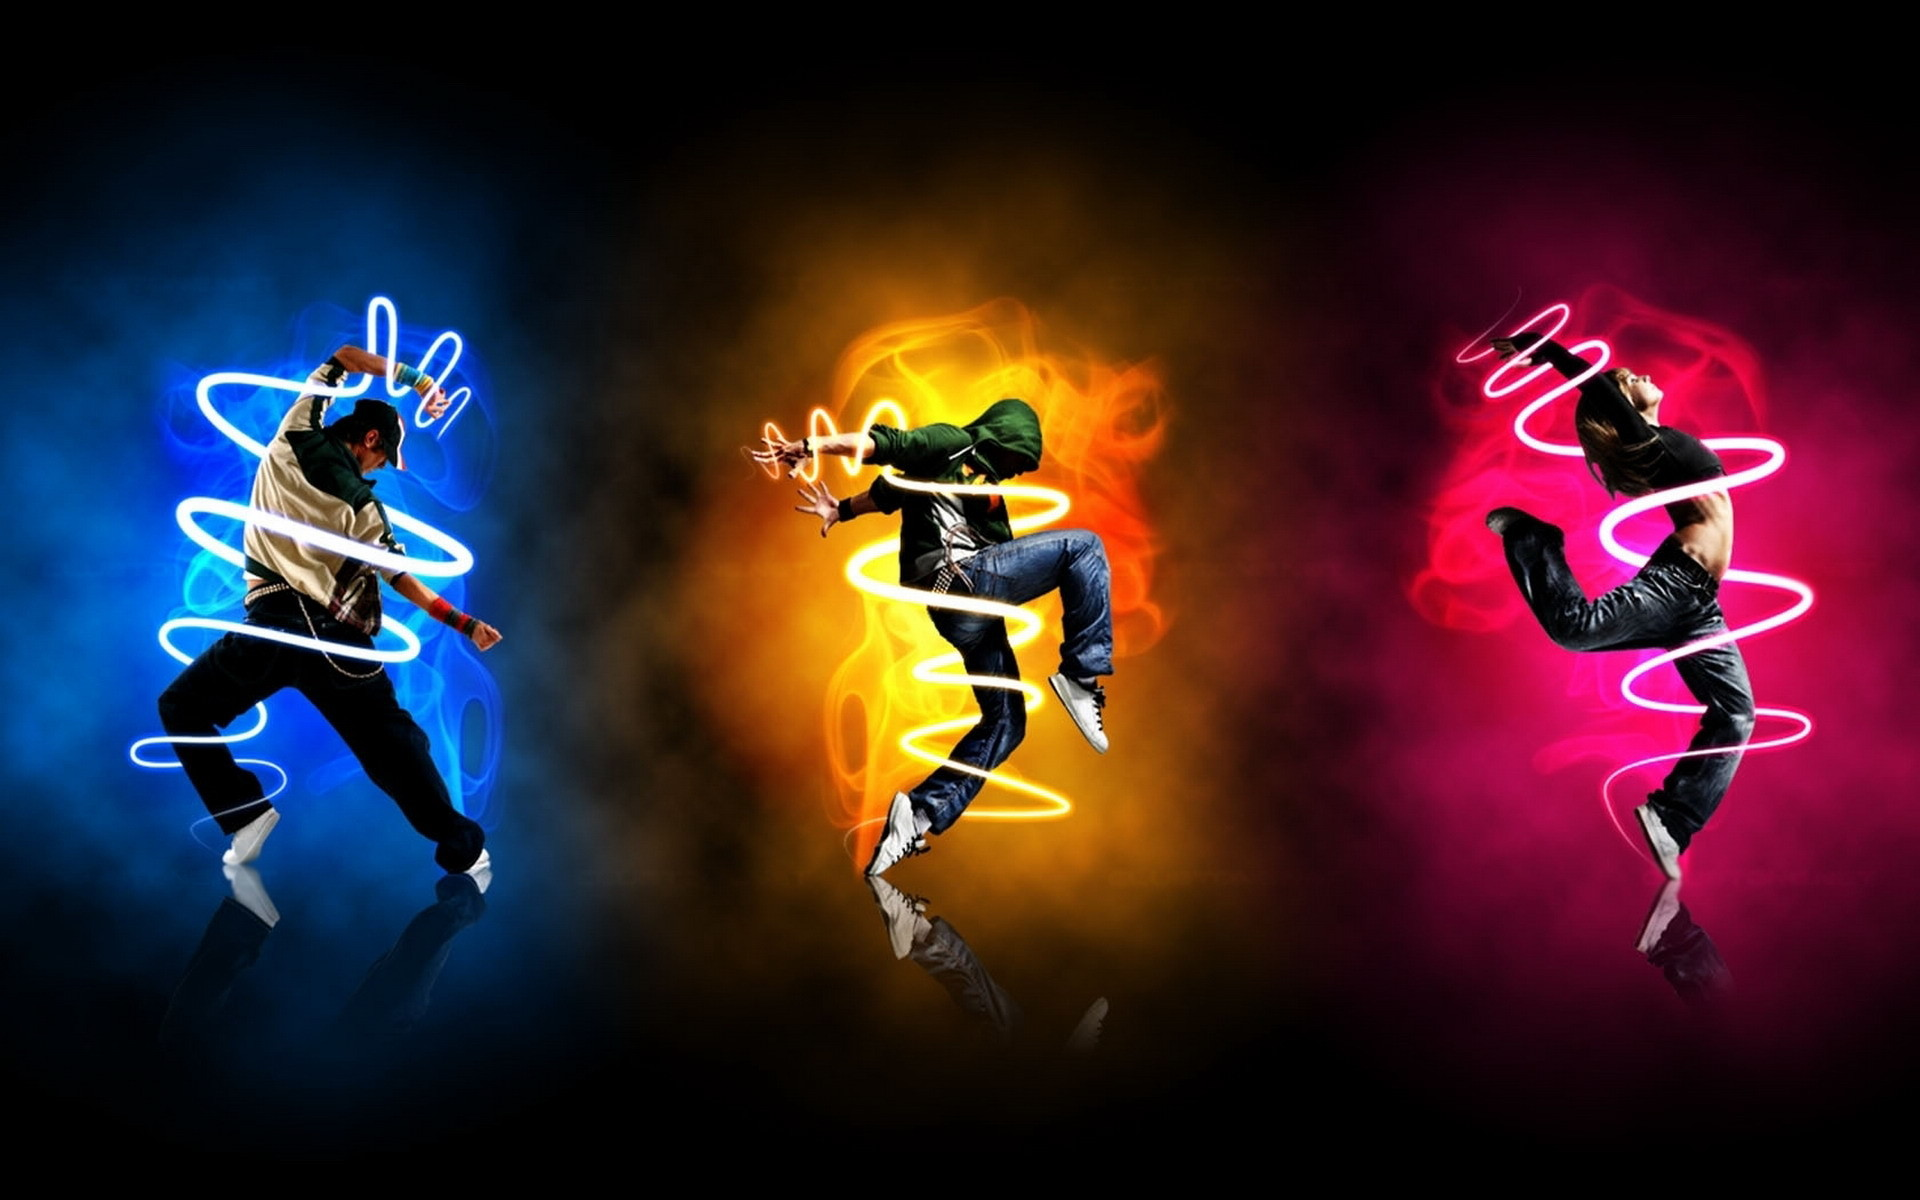 Hip Hop Dance Wallpaper ①